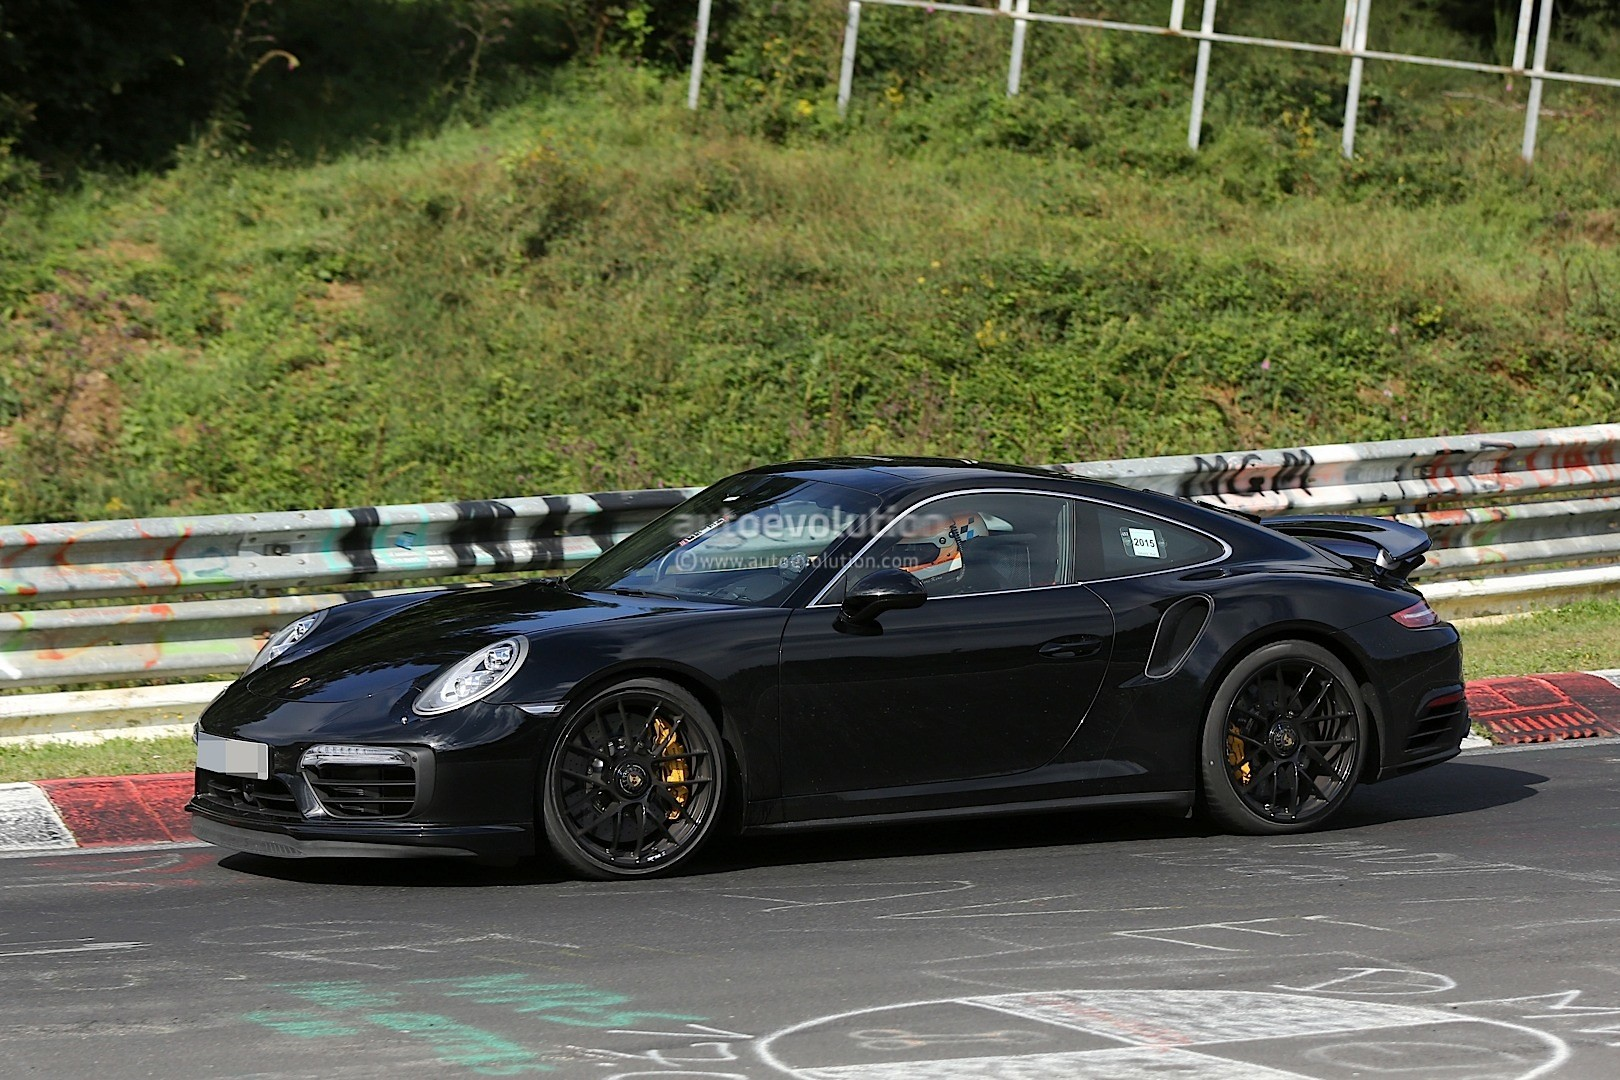 porsche 911 turbo 2016. 2016 porsche 911 turbo s facelift spyshot c